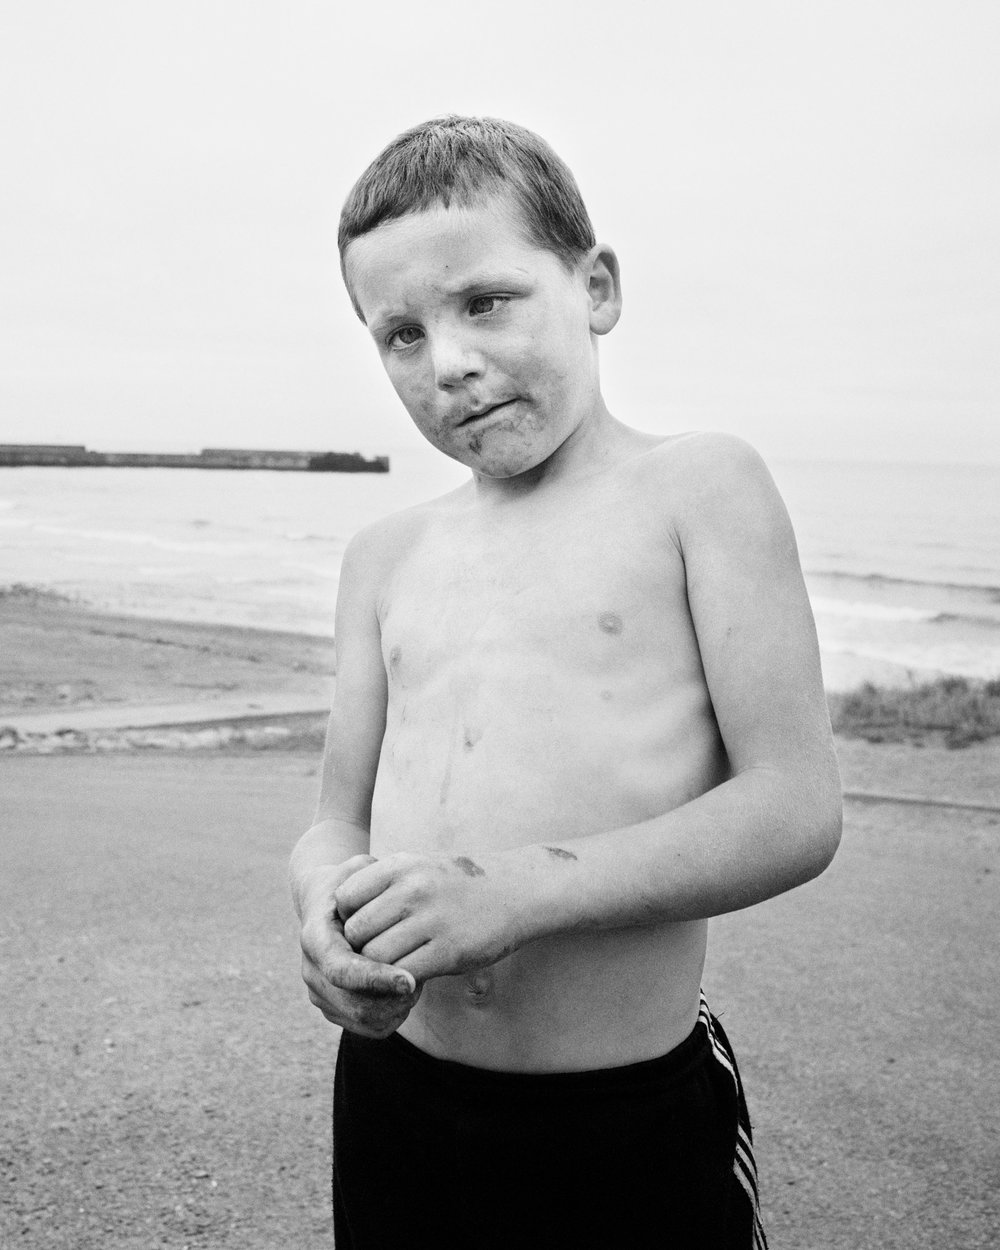 Skinningrove1982 - 84 - Photographs by Chris Killip